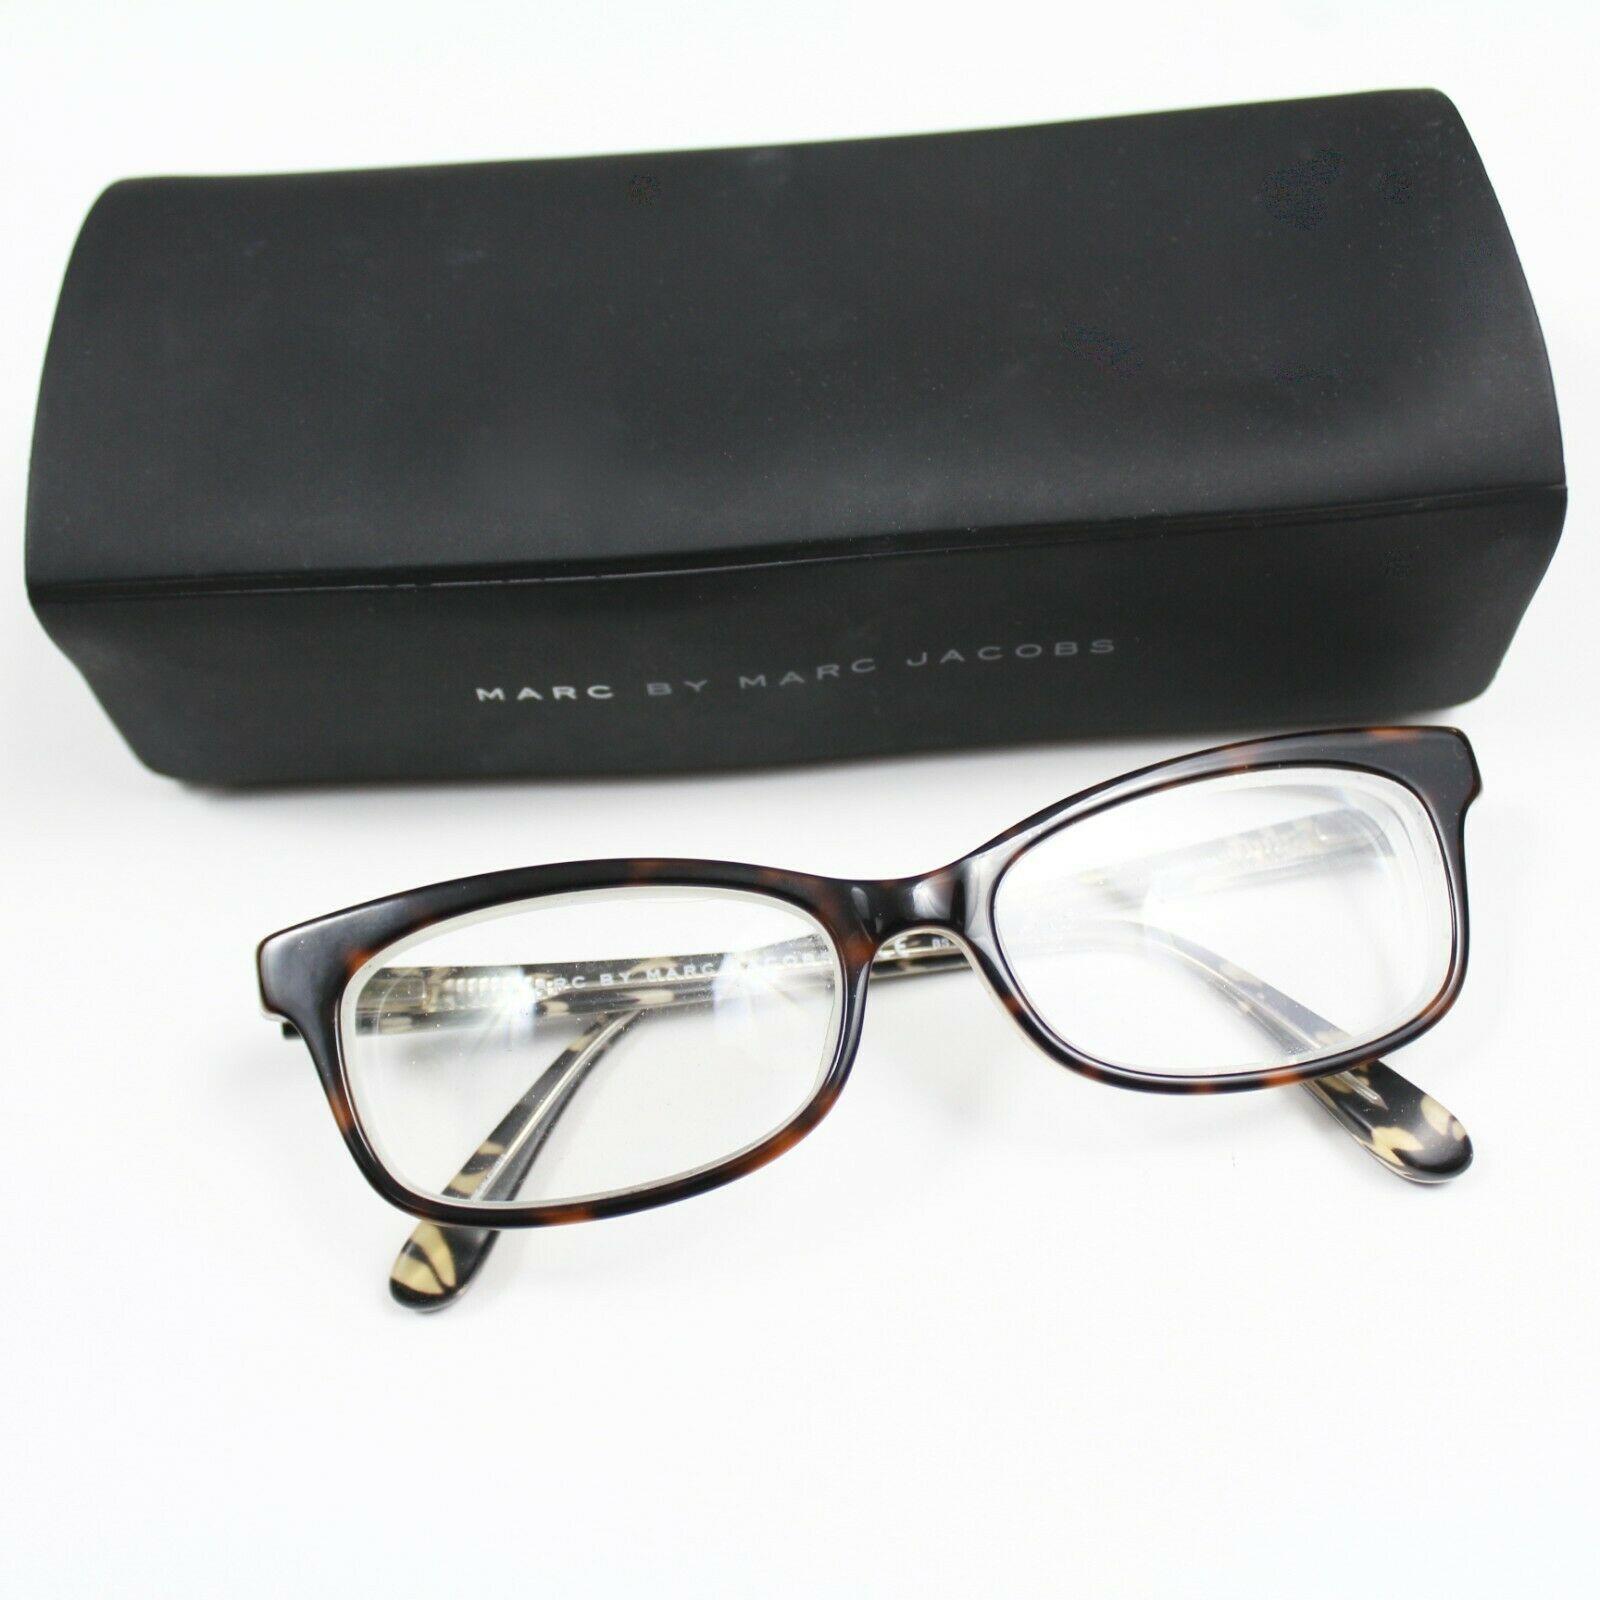 Marc by Marc Jacobs MMJ 486 OA3 Tortoise RX Eyeglasses Frames 52 16 135 Case - $69.29